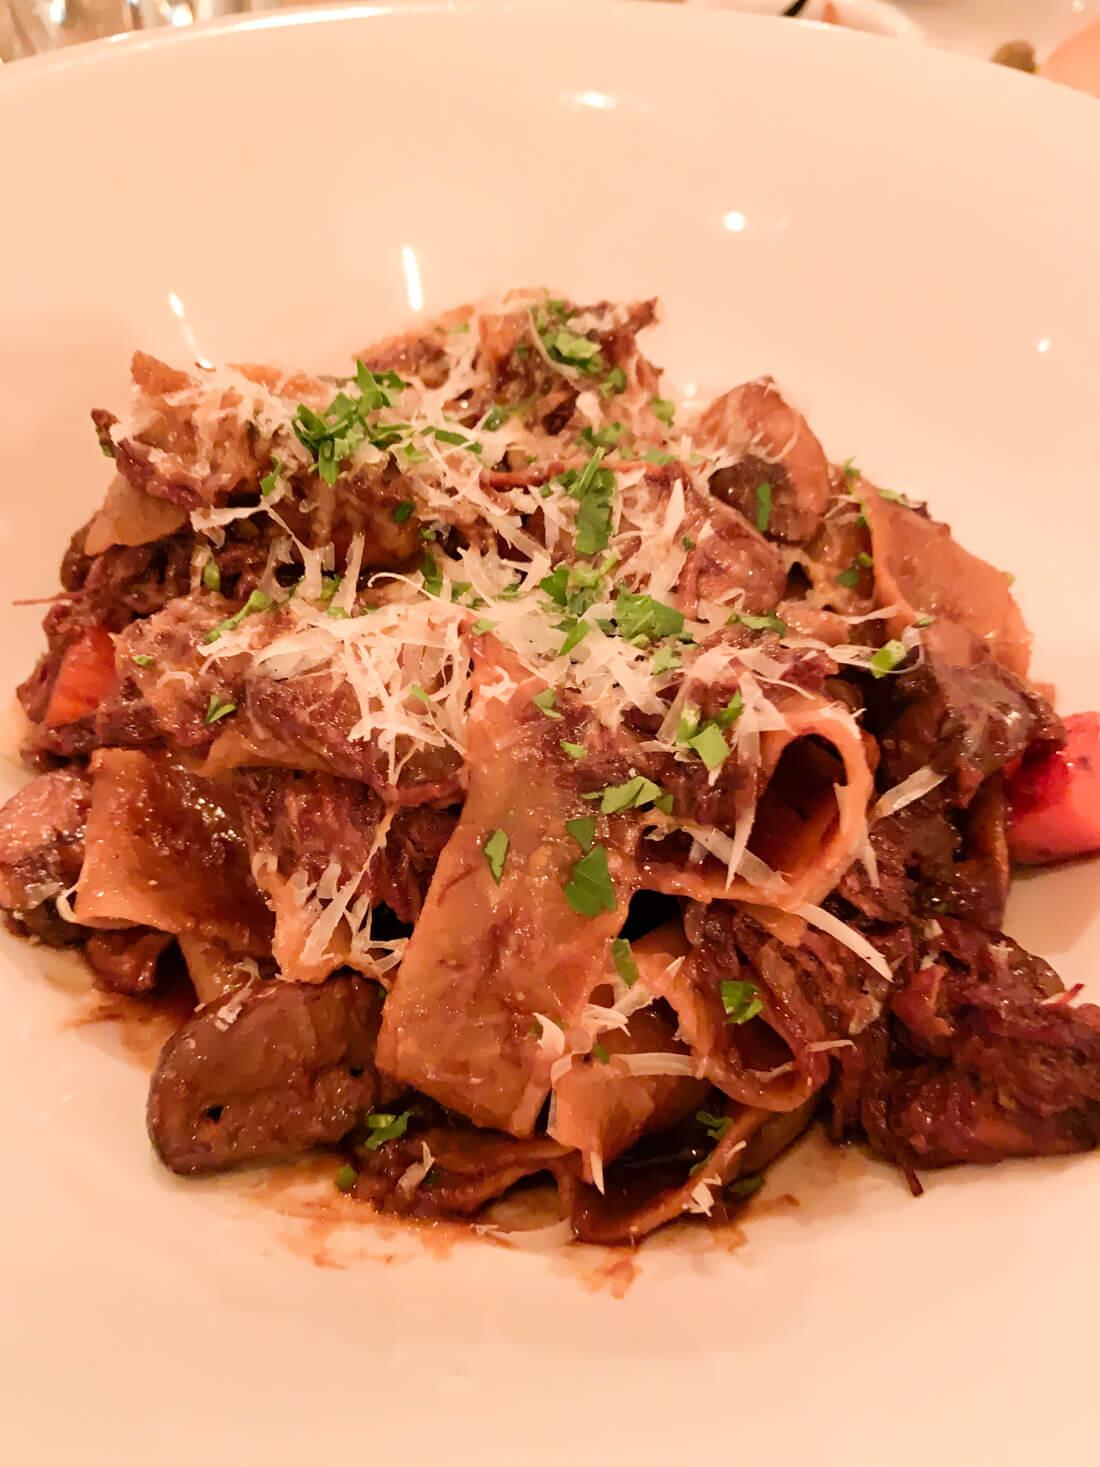 Best San Diego Restaurants - Cucina Enoteca, amazing Pappardelle